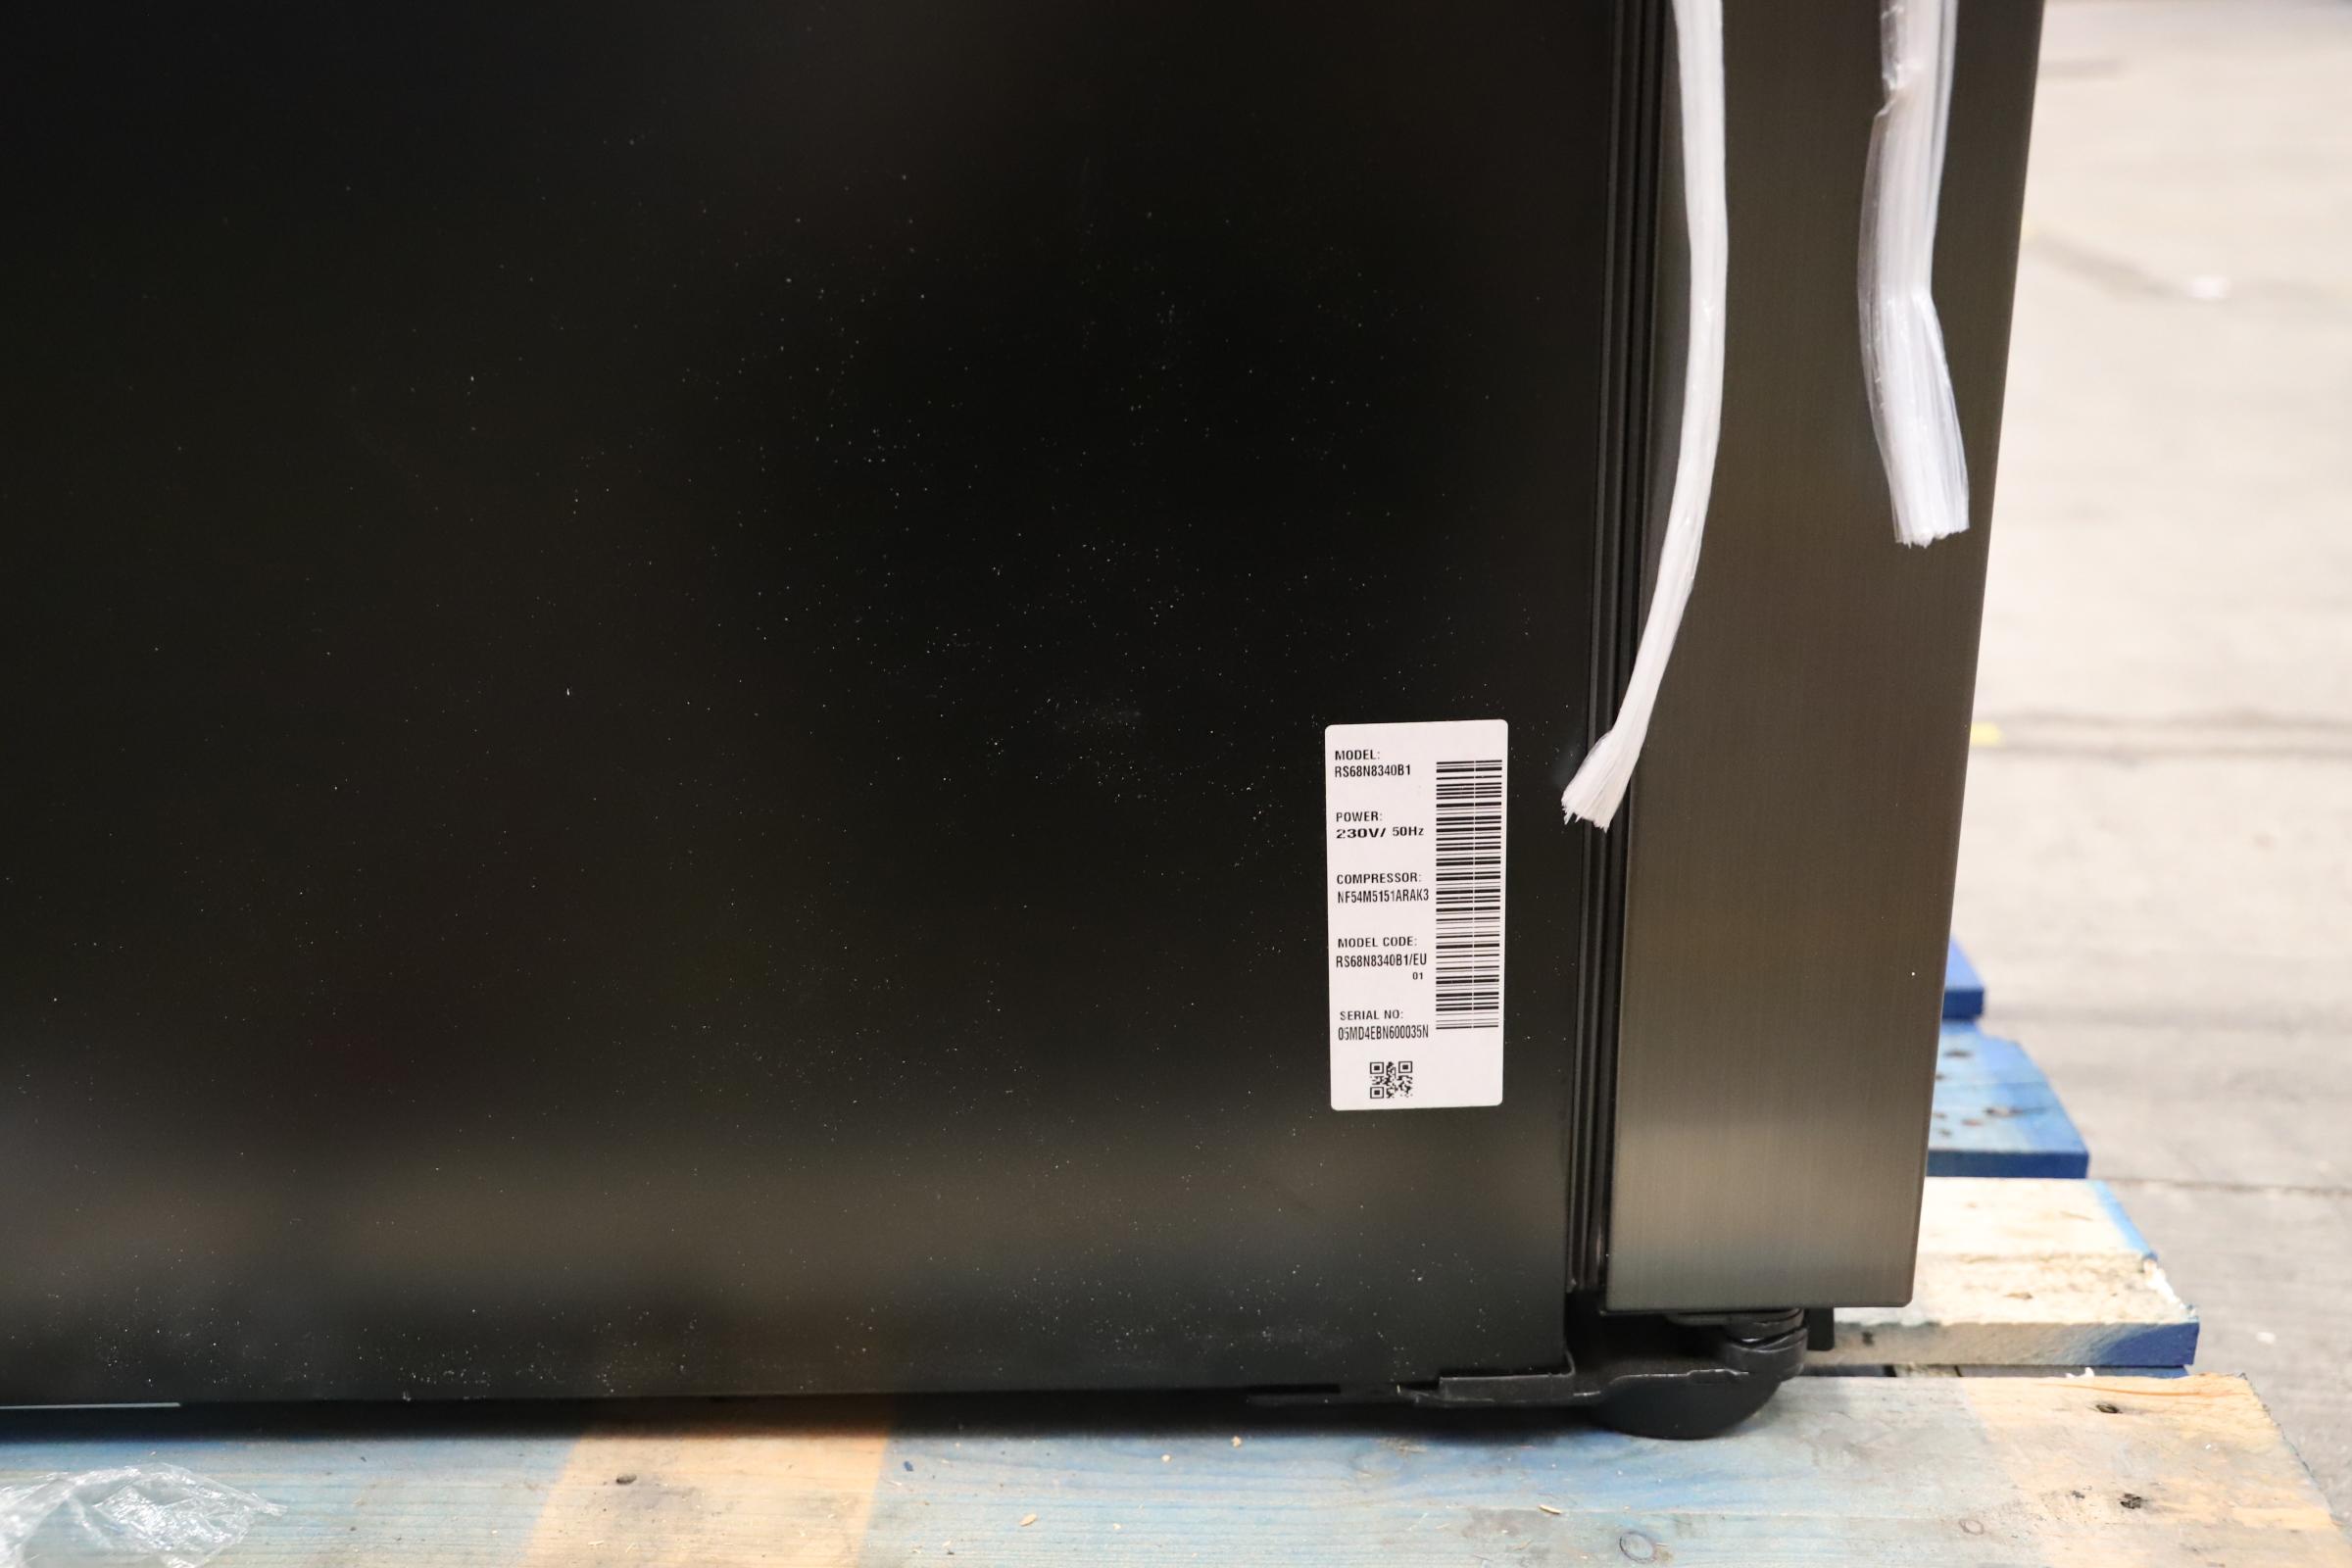 Pallet of 1 Samsung Water & Ice Fridge freezer. Latest selling price £1,799.99 - Image 10 of 10